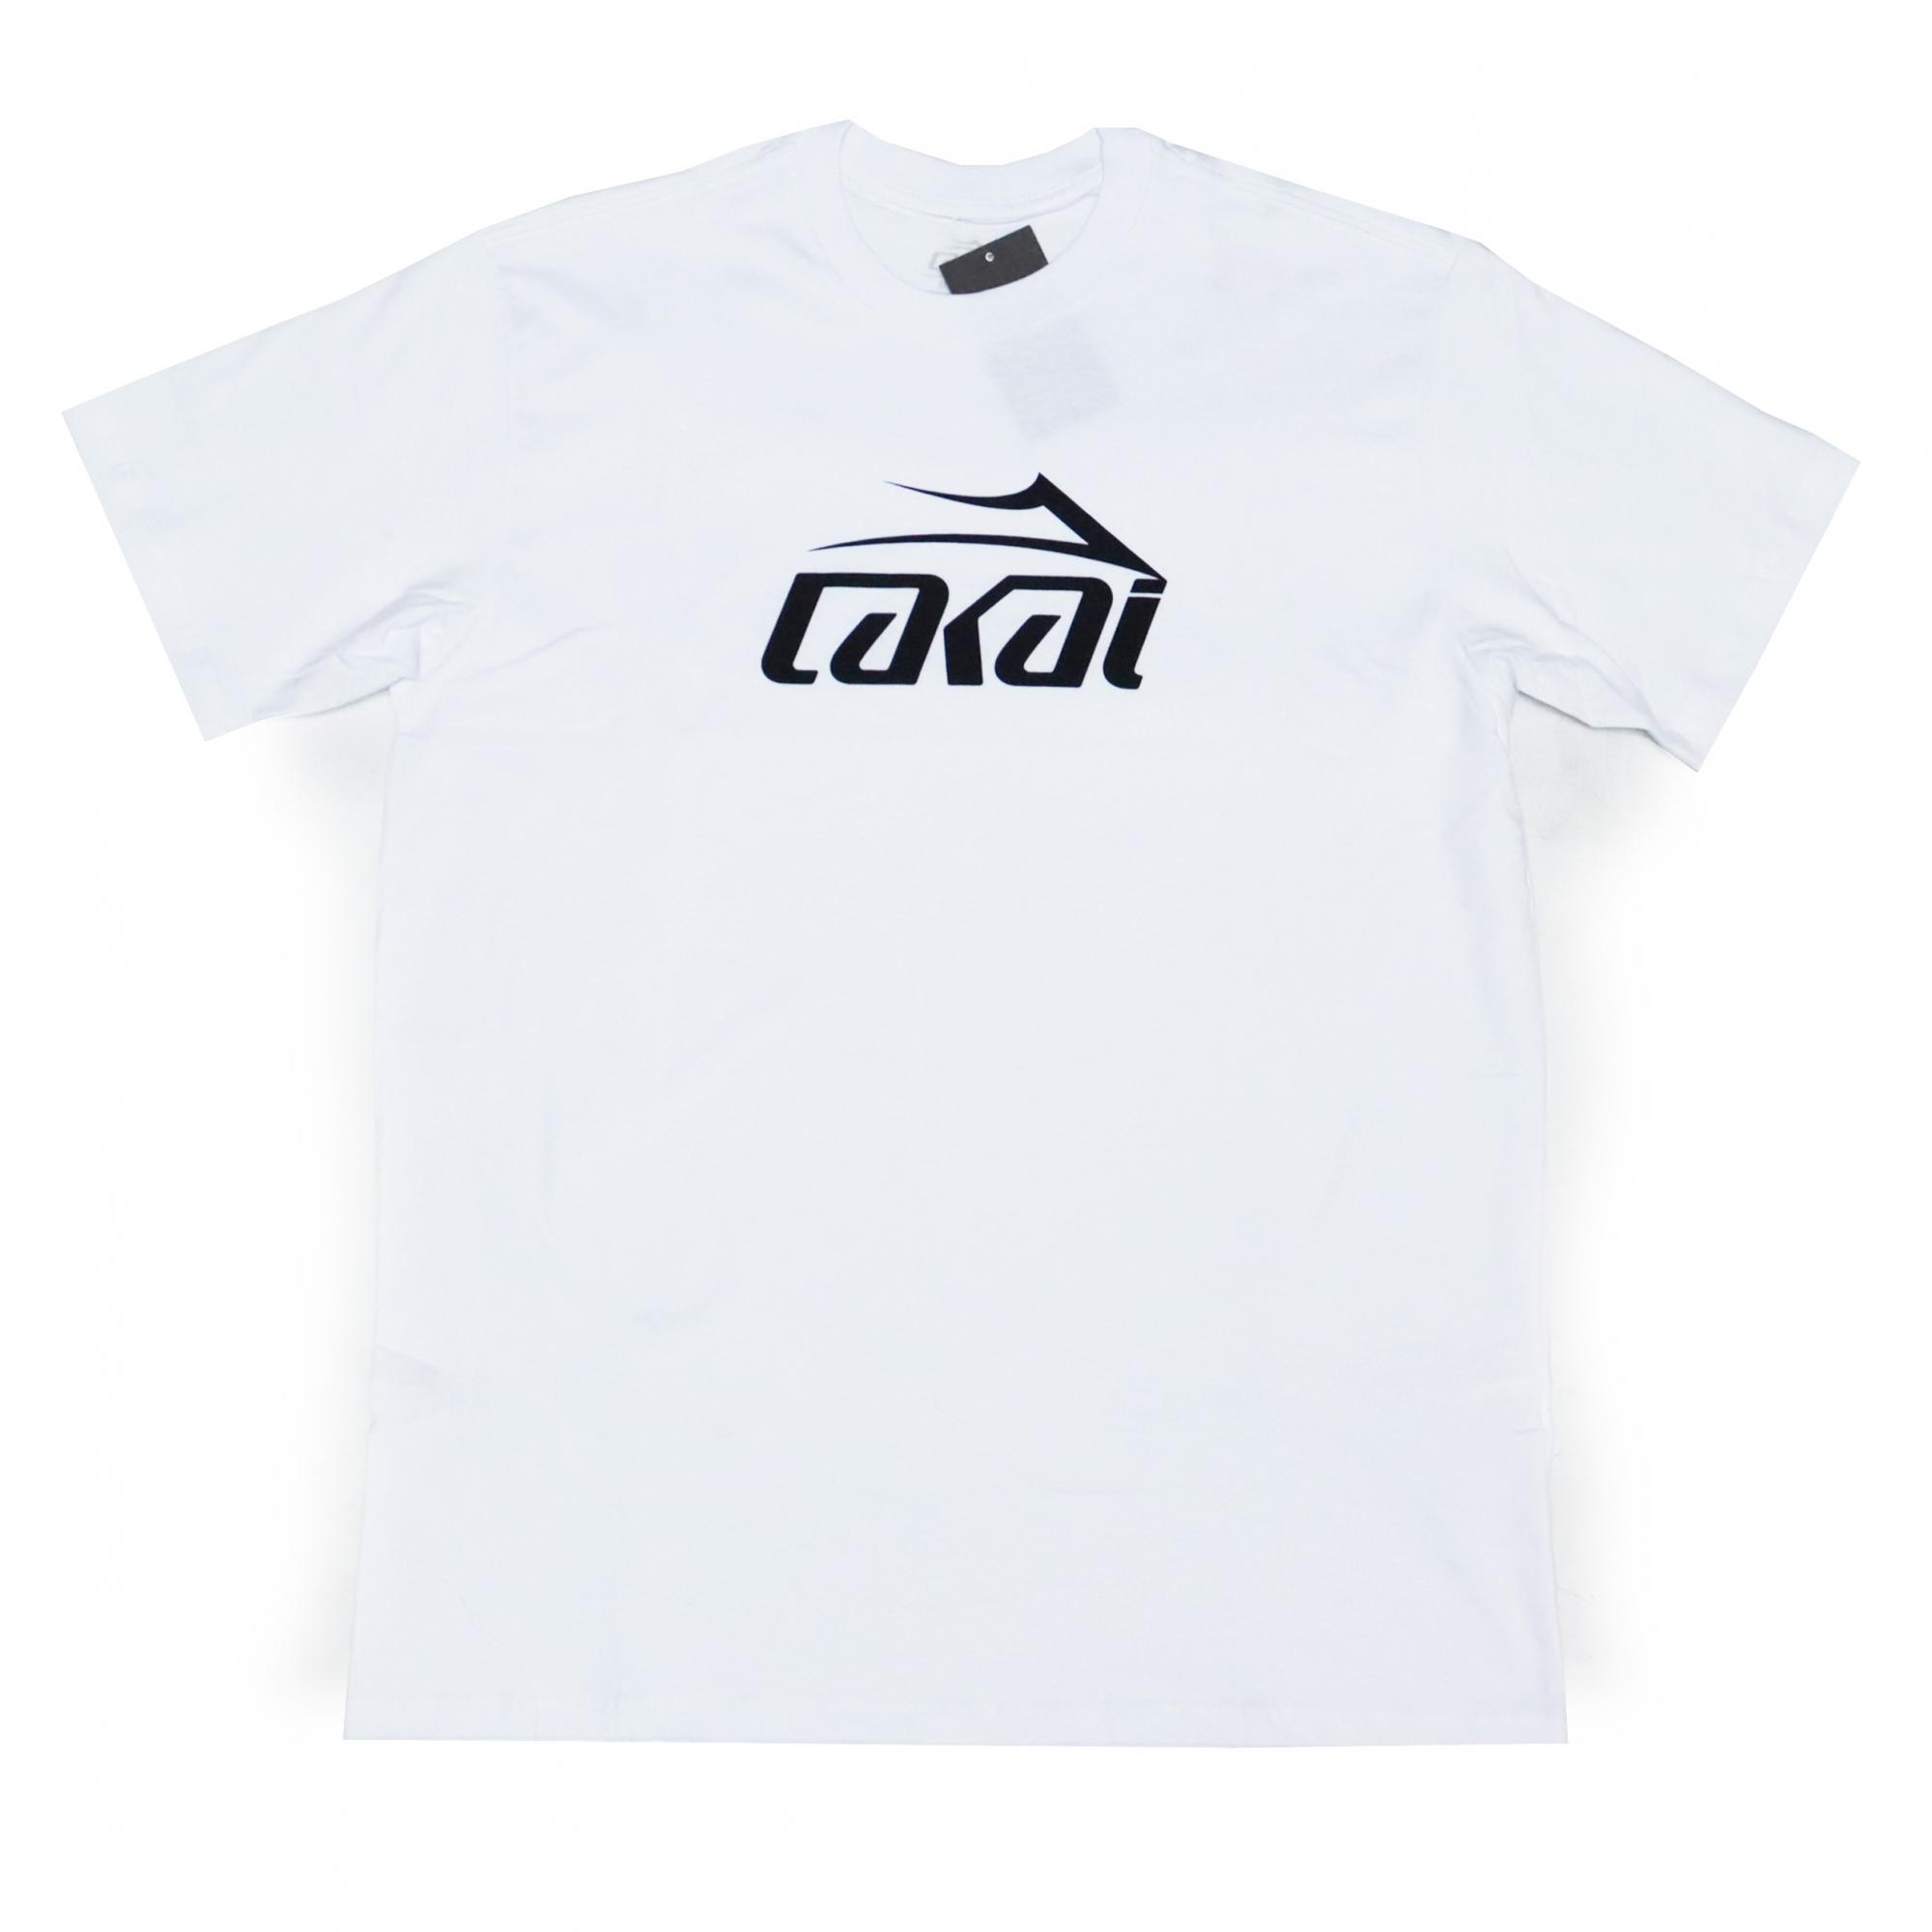 Camiseta Lakai Basic - Branco